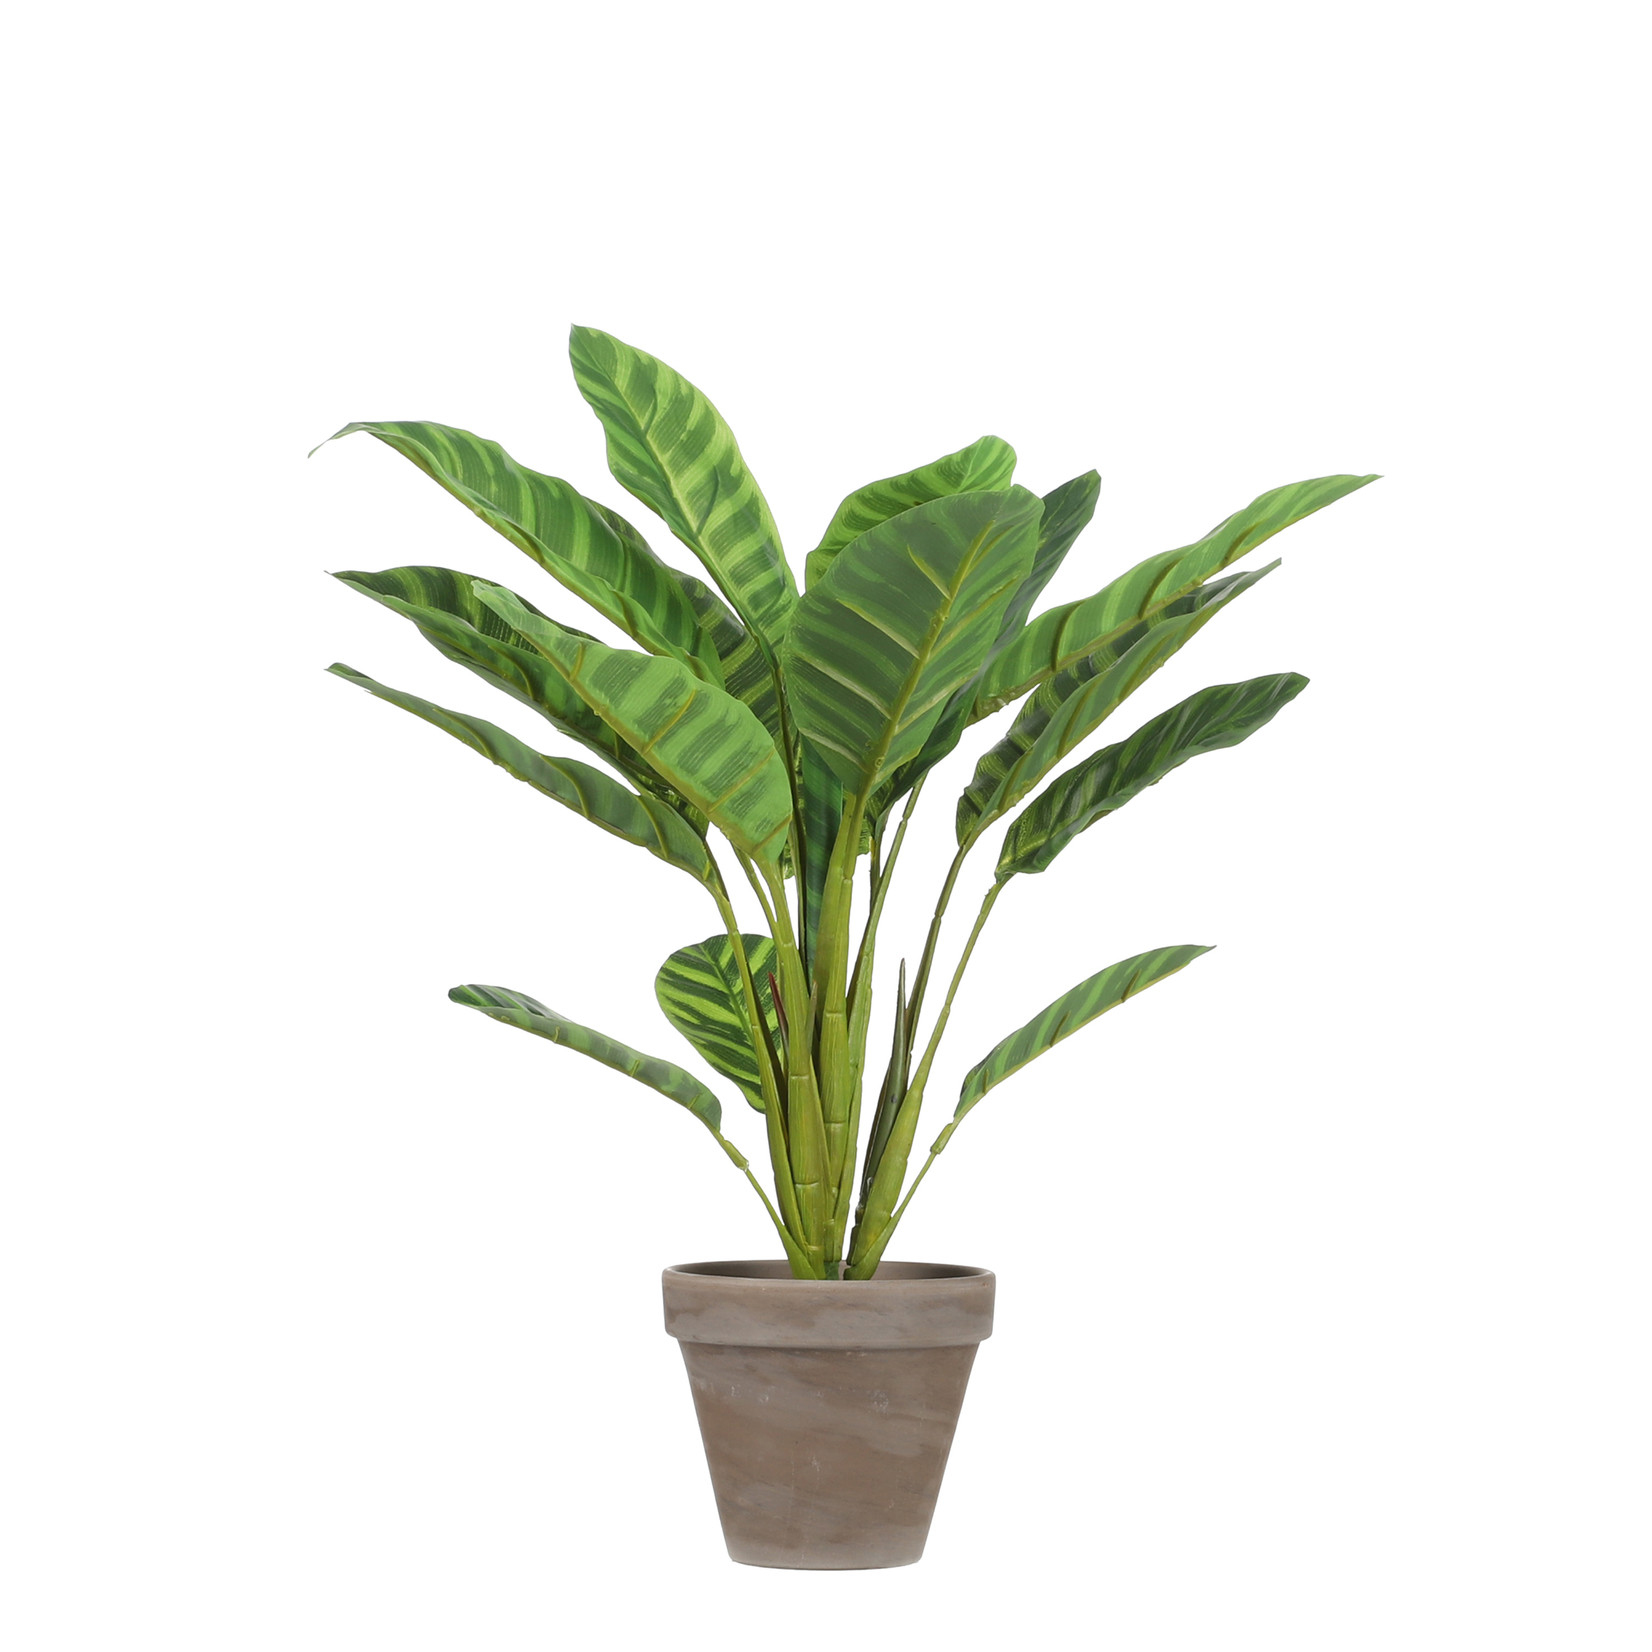 MiCa Calathea l.groen in pot Stan grey d11,5cm